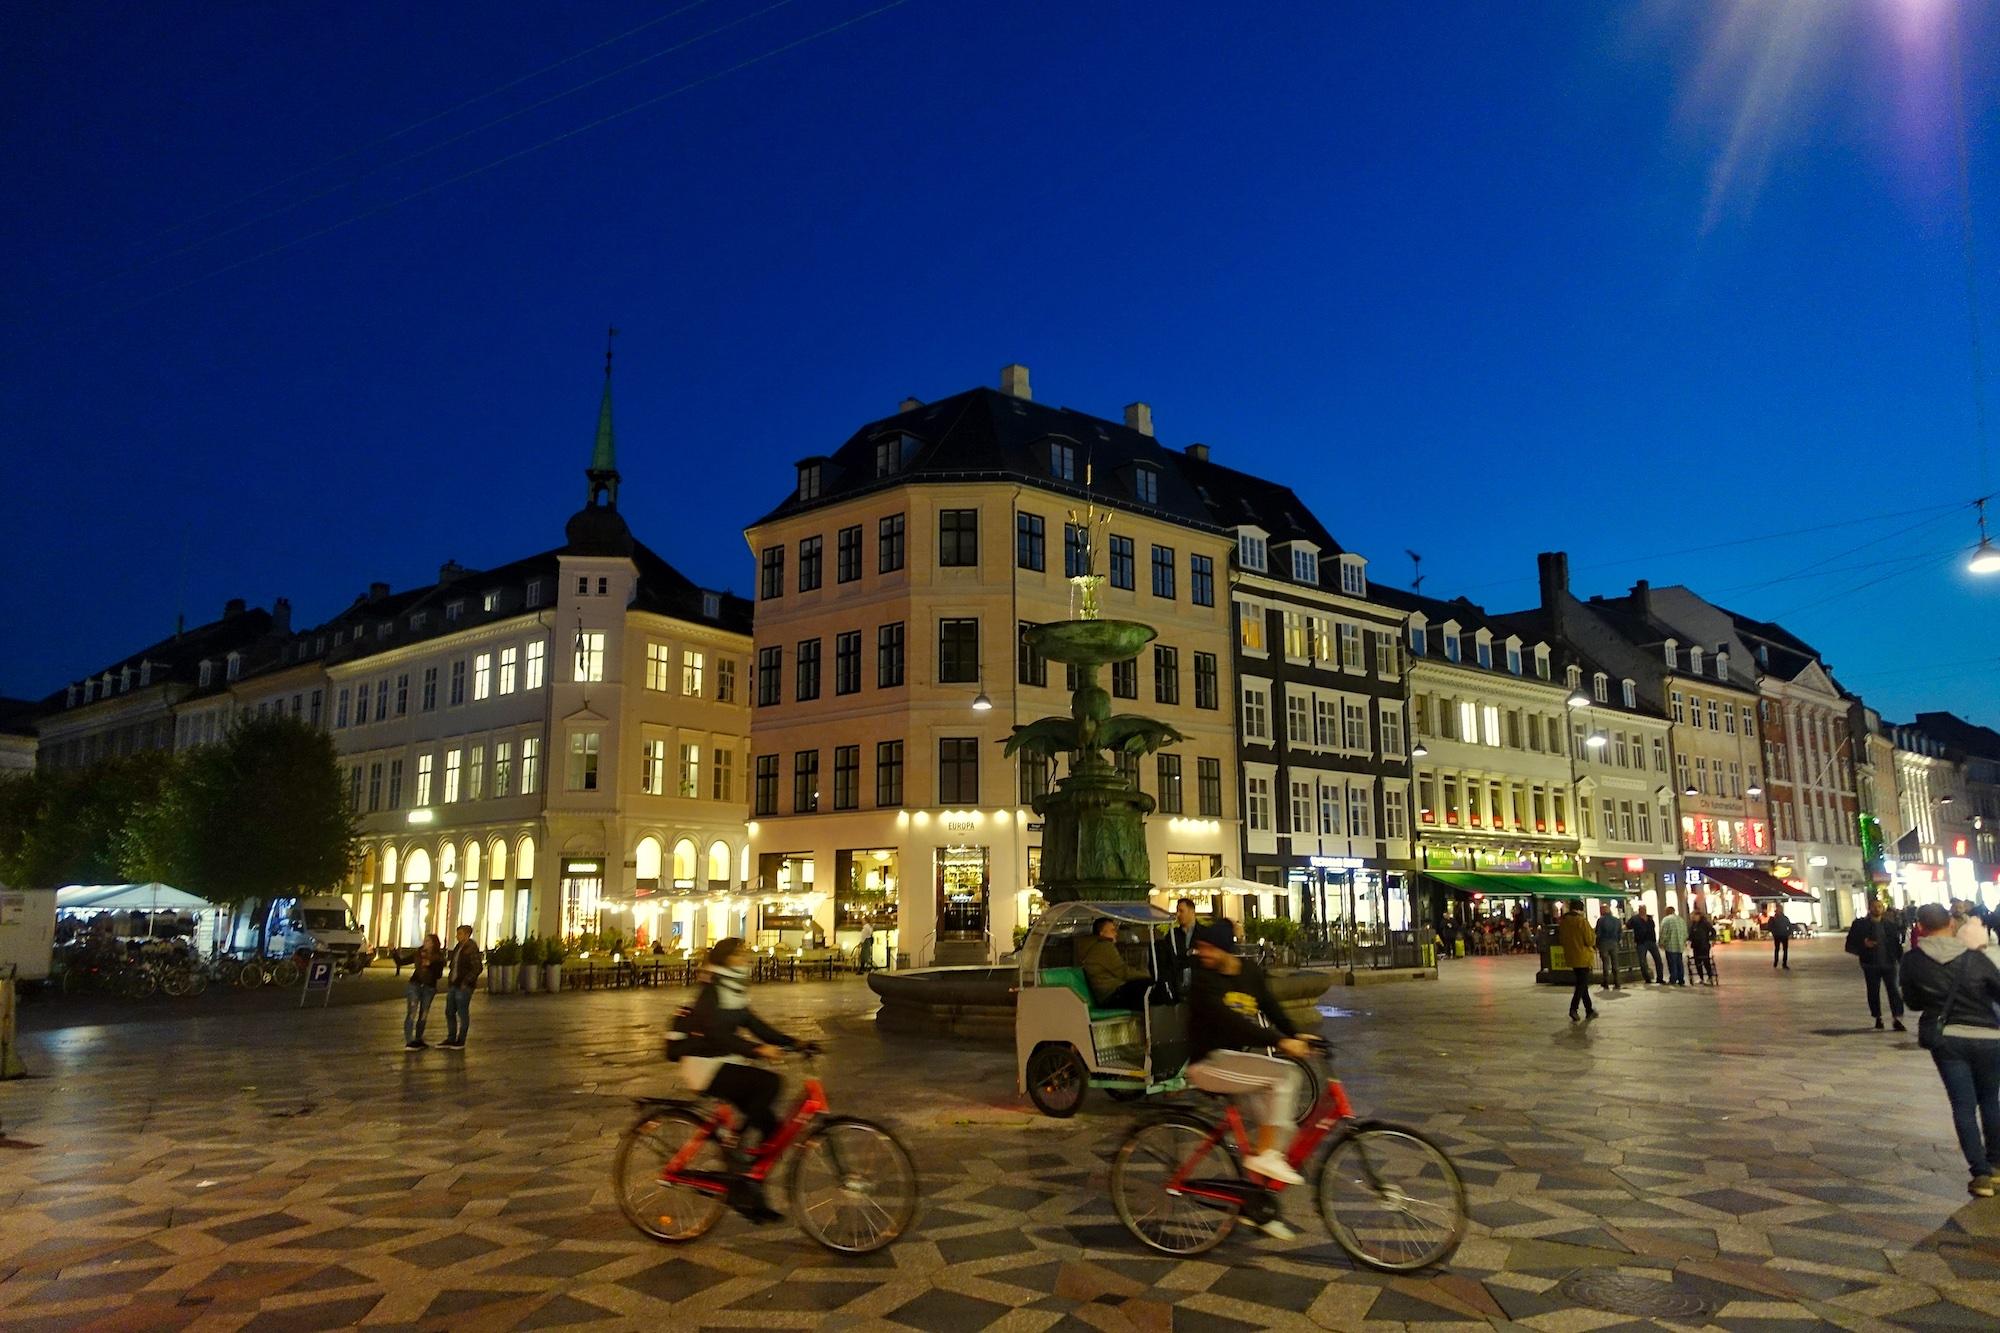 Evening Buzz in Højbro Plads Public Square